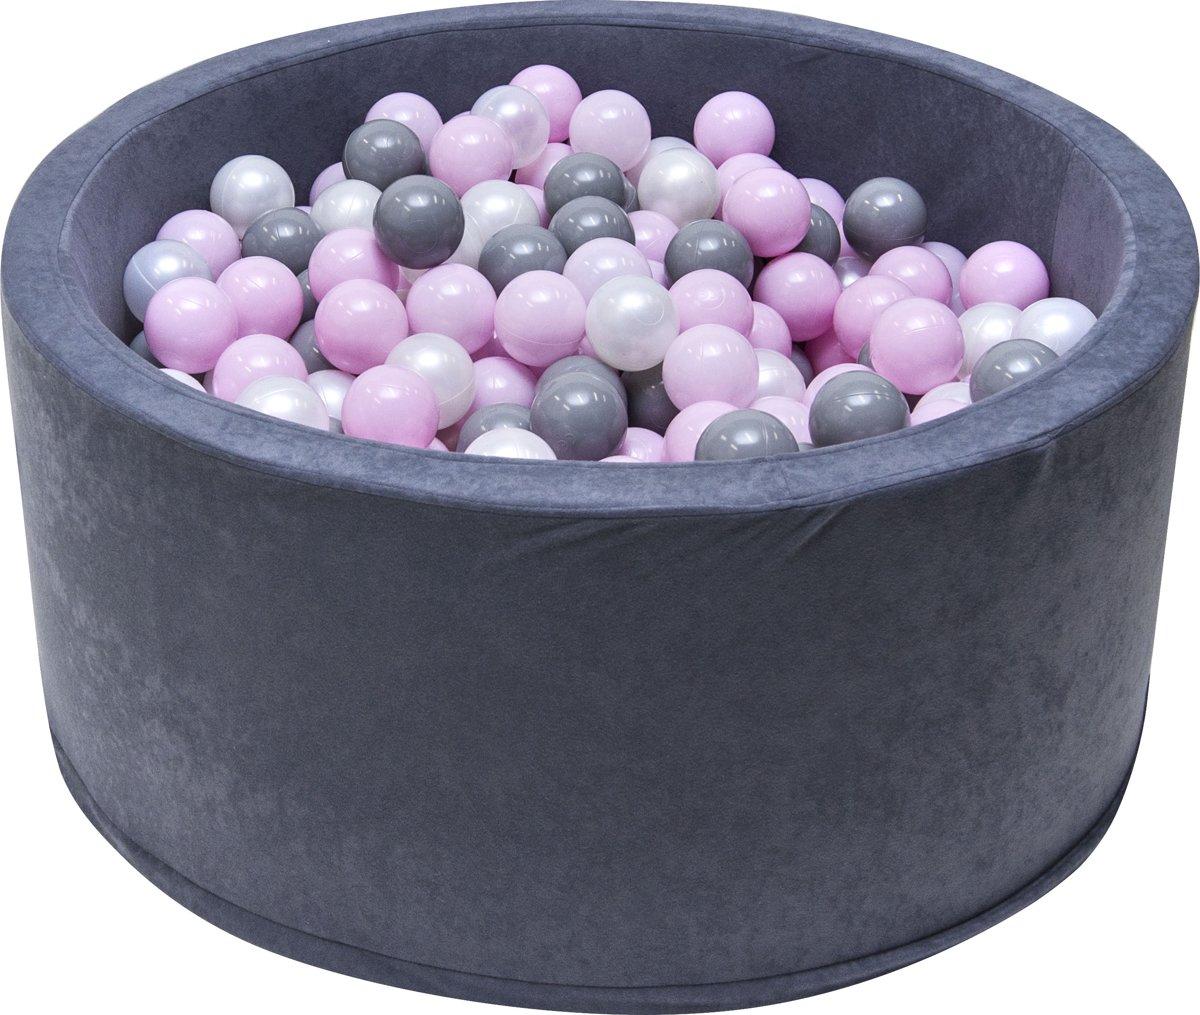 Ballenbak | Zwart incl.  200 witte, grijze en roze ballen